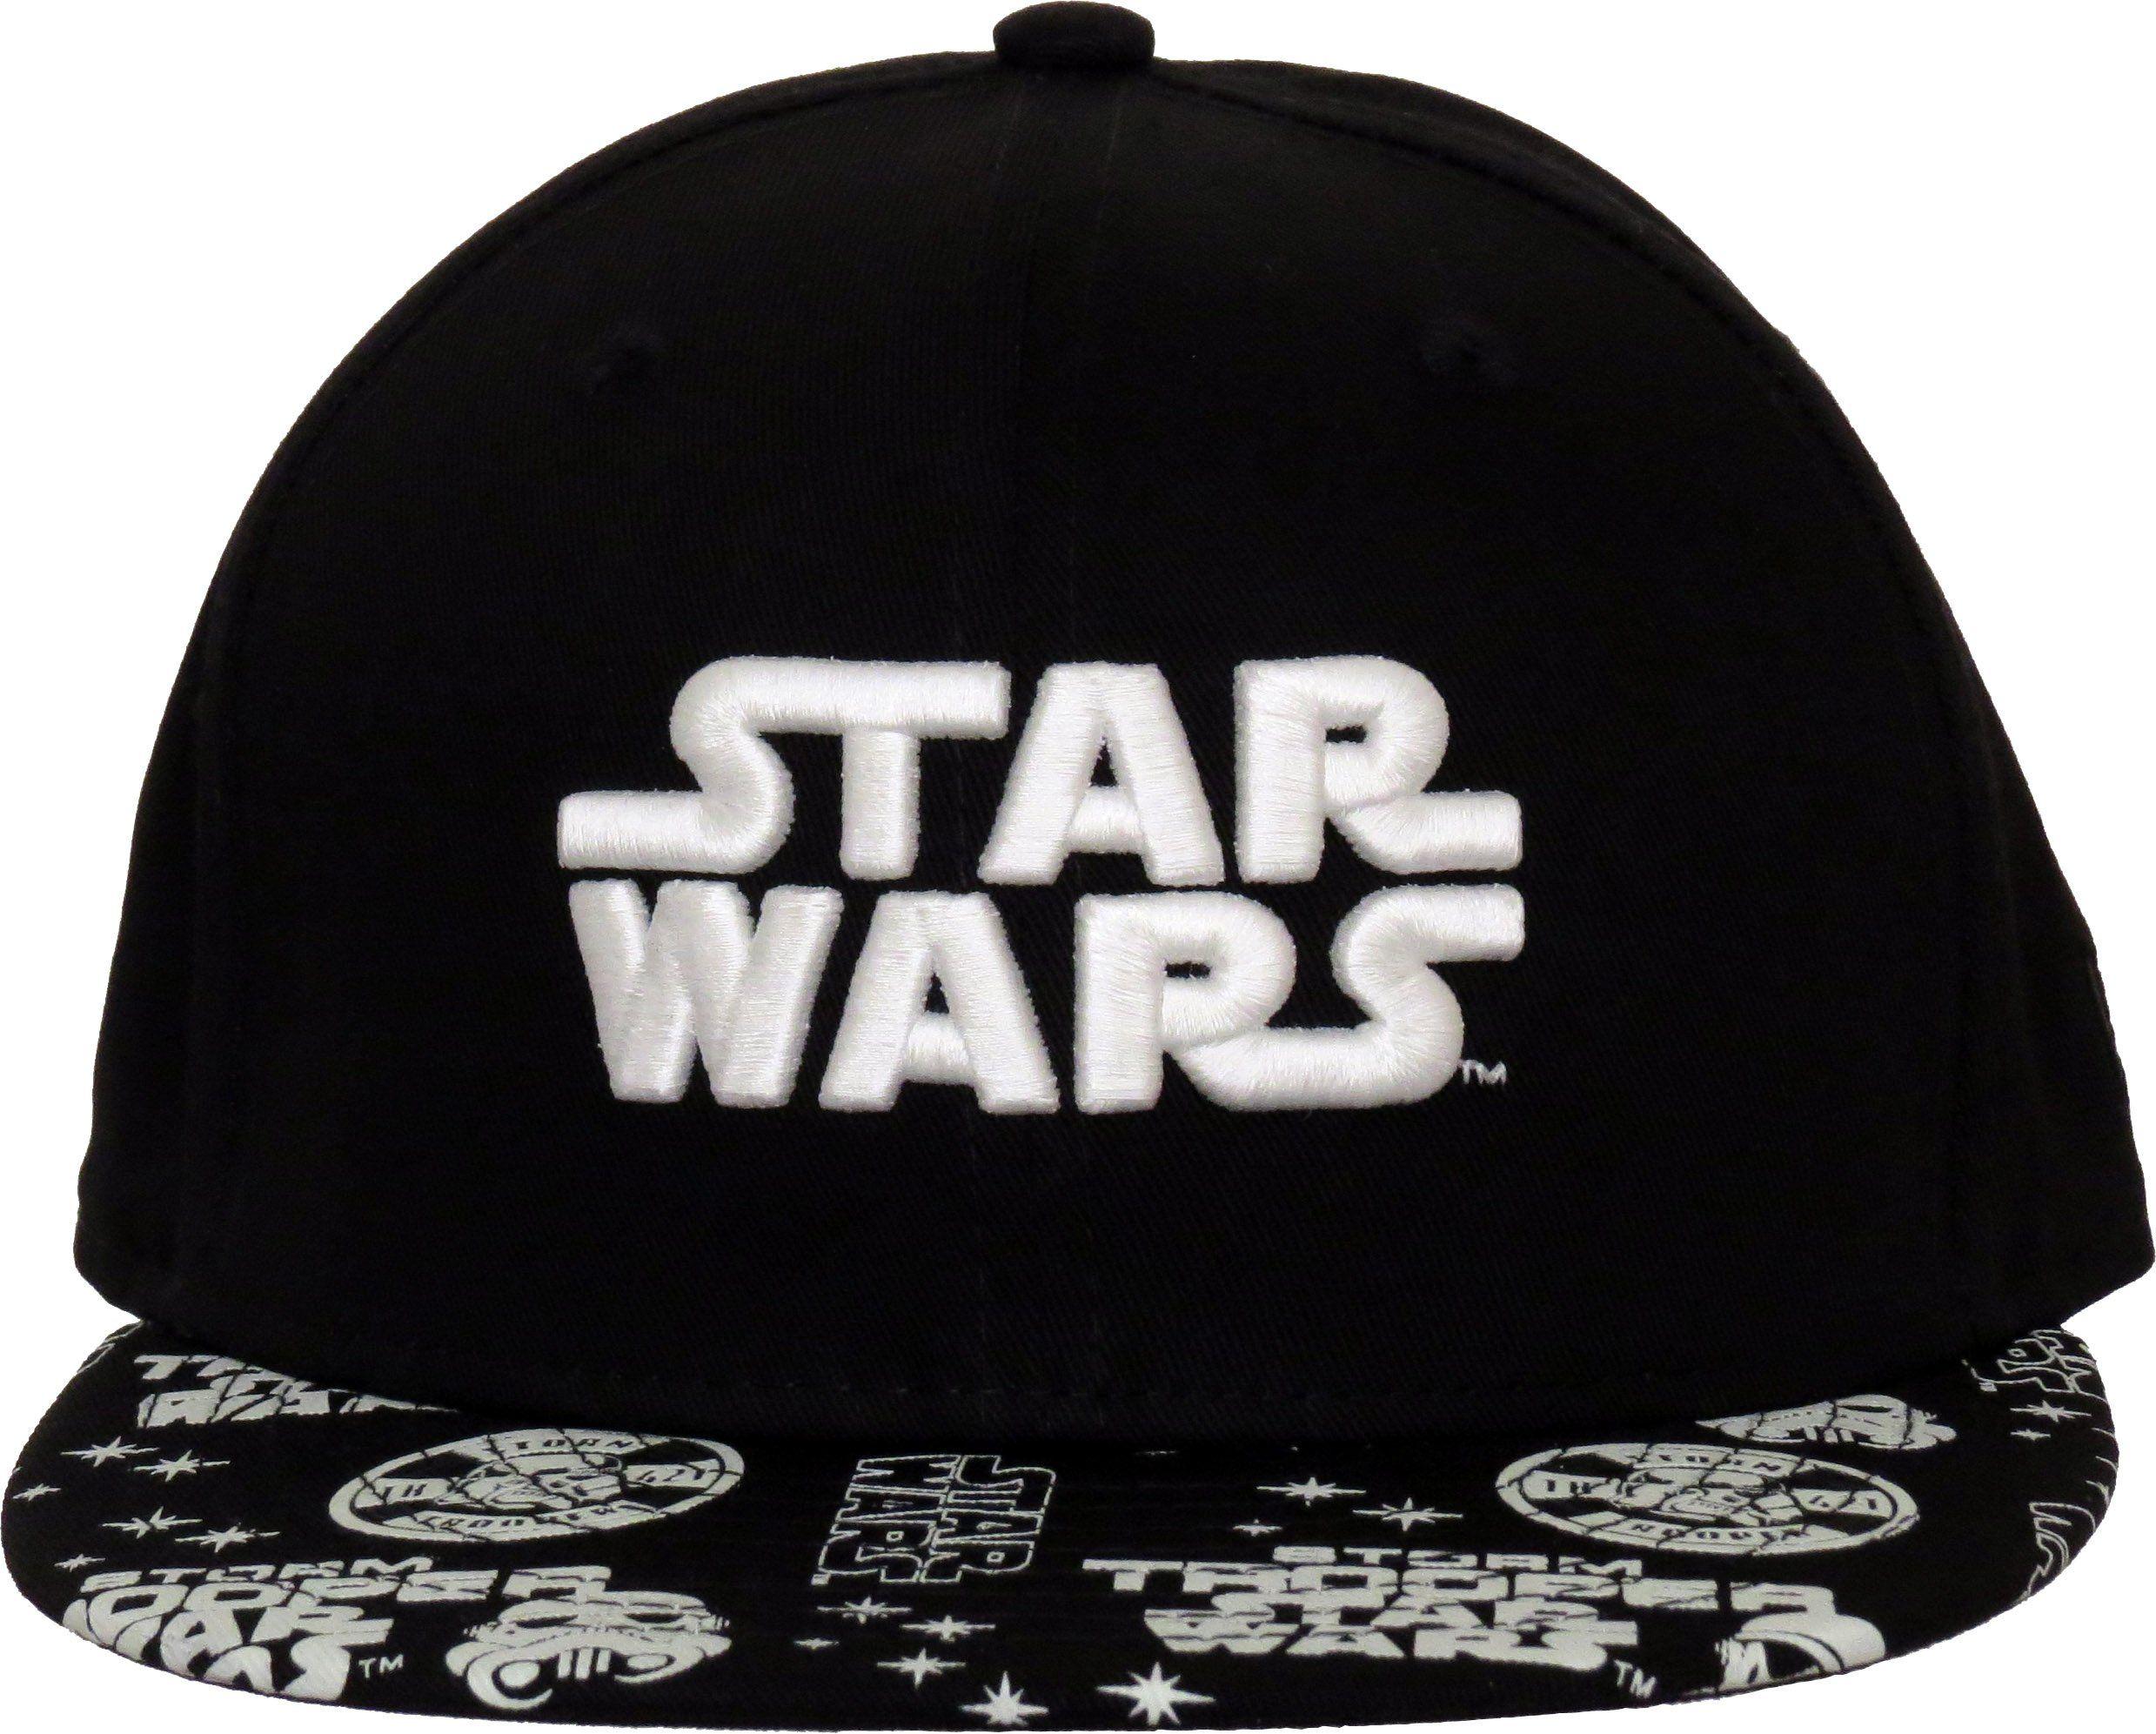 cheaper 563de 92f70 New Era Kids 950 Glow In The Dark Star Wars Snapback Cap. Black with the